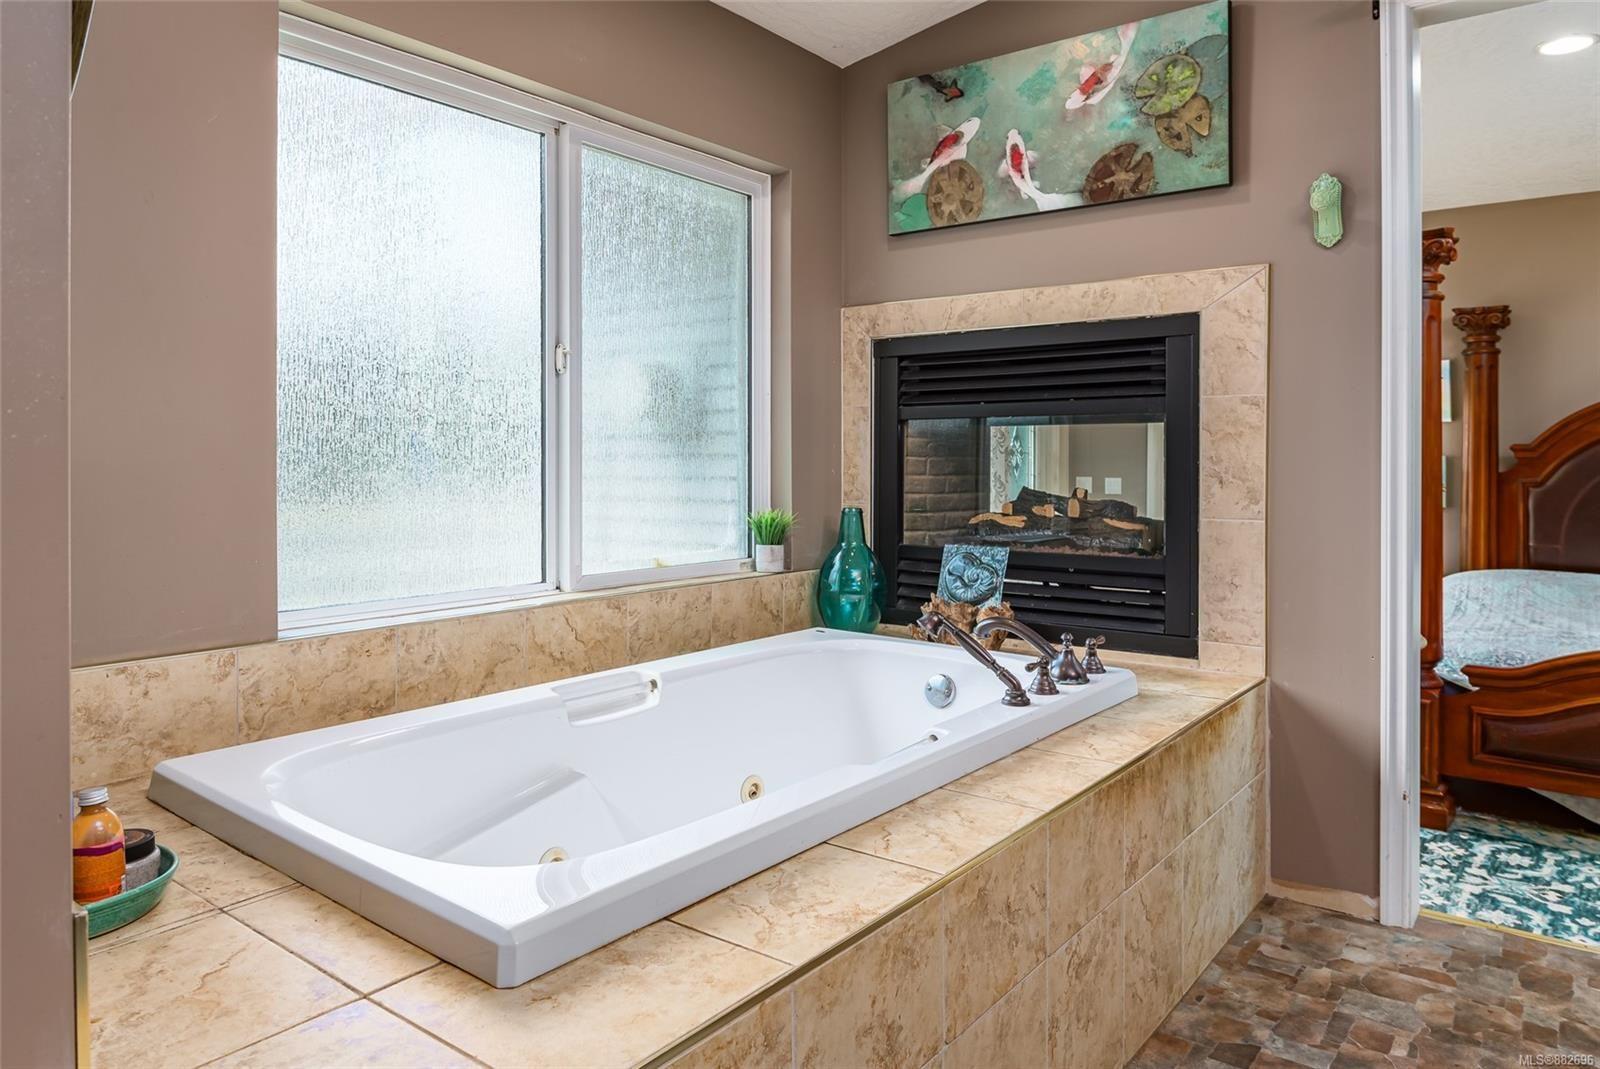 Photo 18: Photos: 3554 MacAulay Rd in : CV Merville Black Creek House for sale (Comox Valley)  : MLS®# 882696